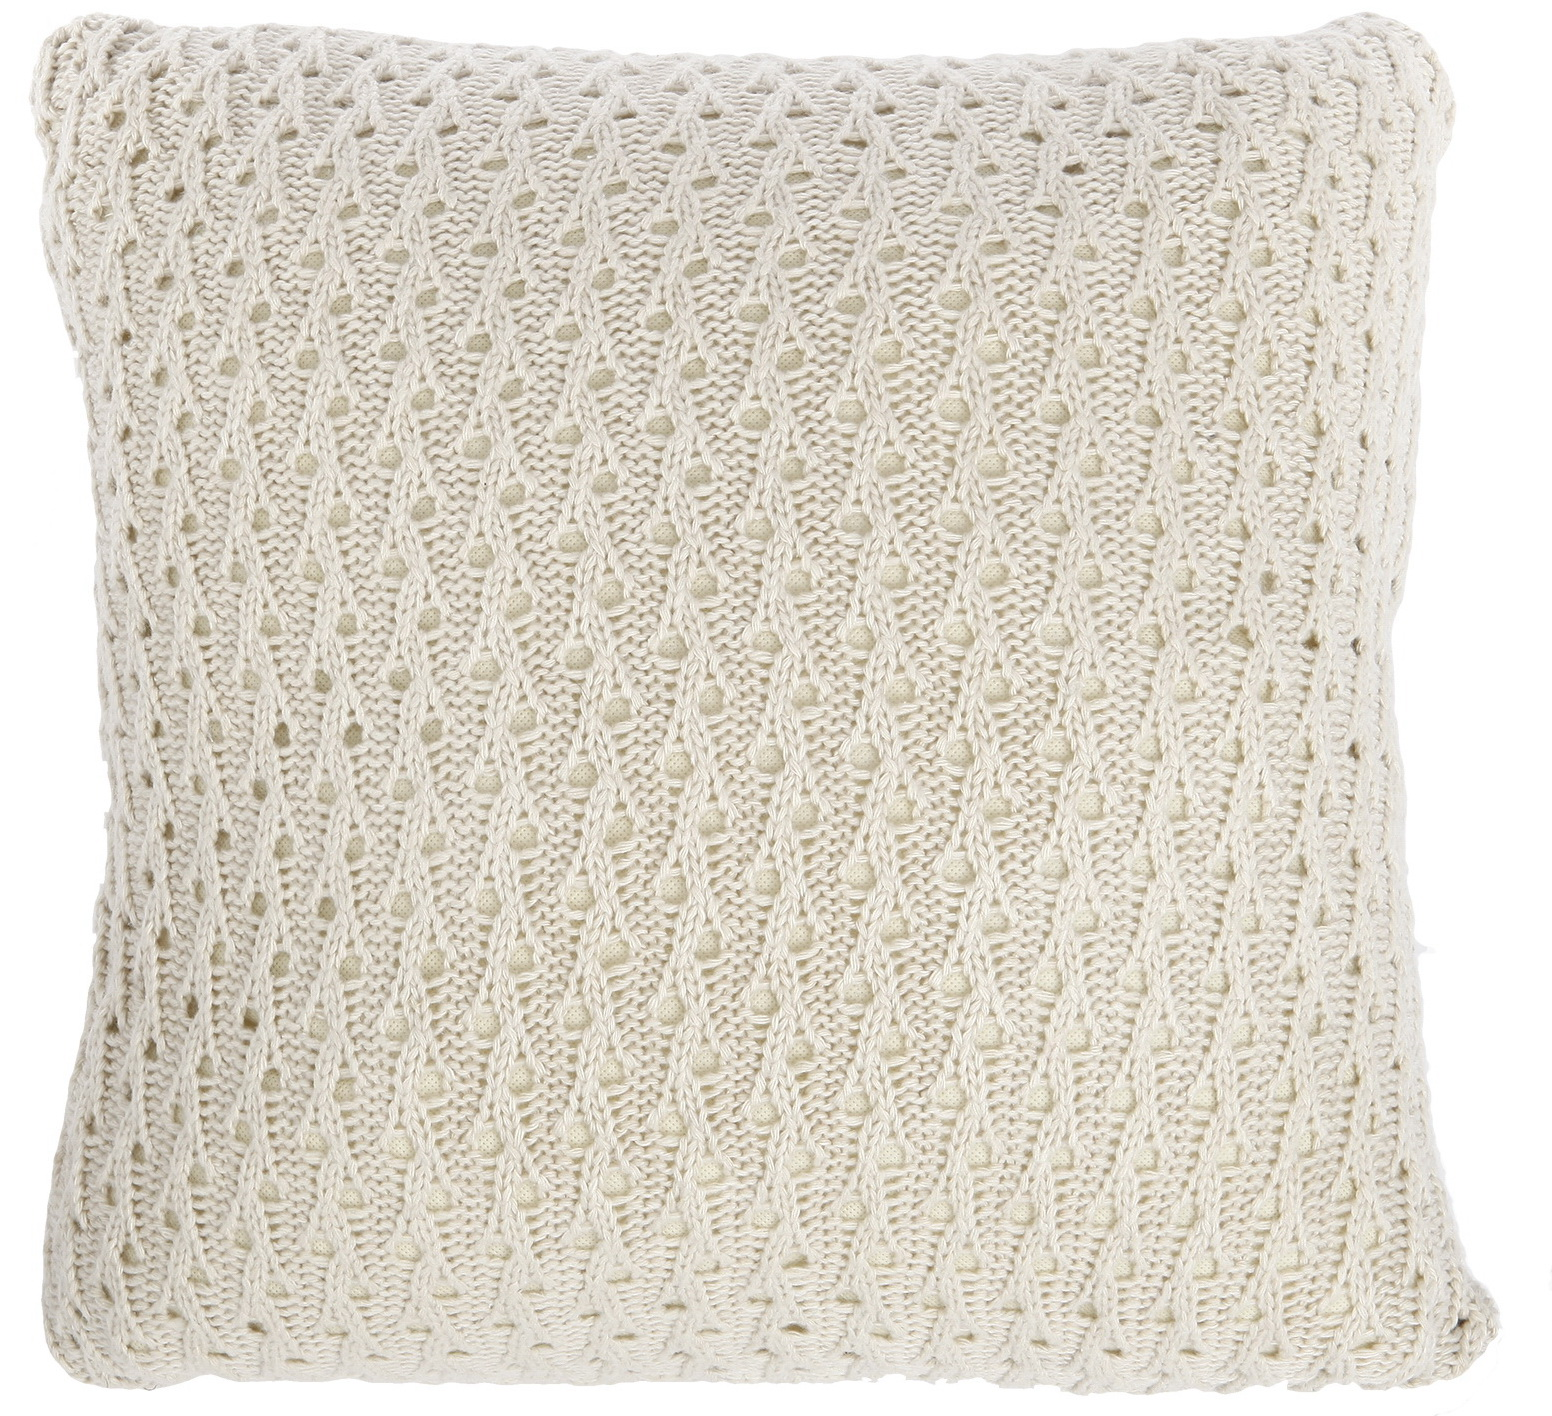 Декоративные подушки ARTEVALUCE Декоративная подушка Evita Цвет: Бежевый (46х46)